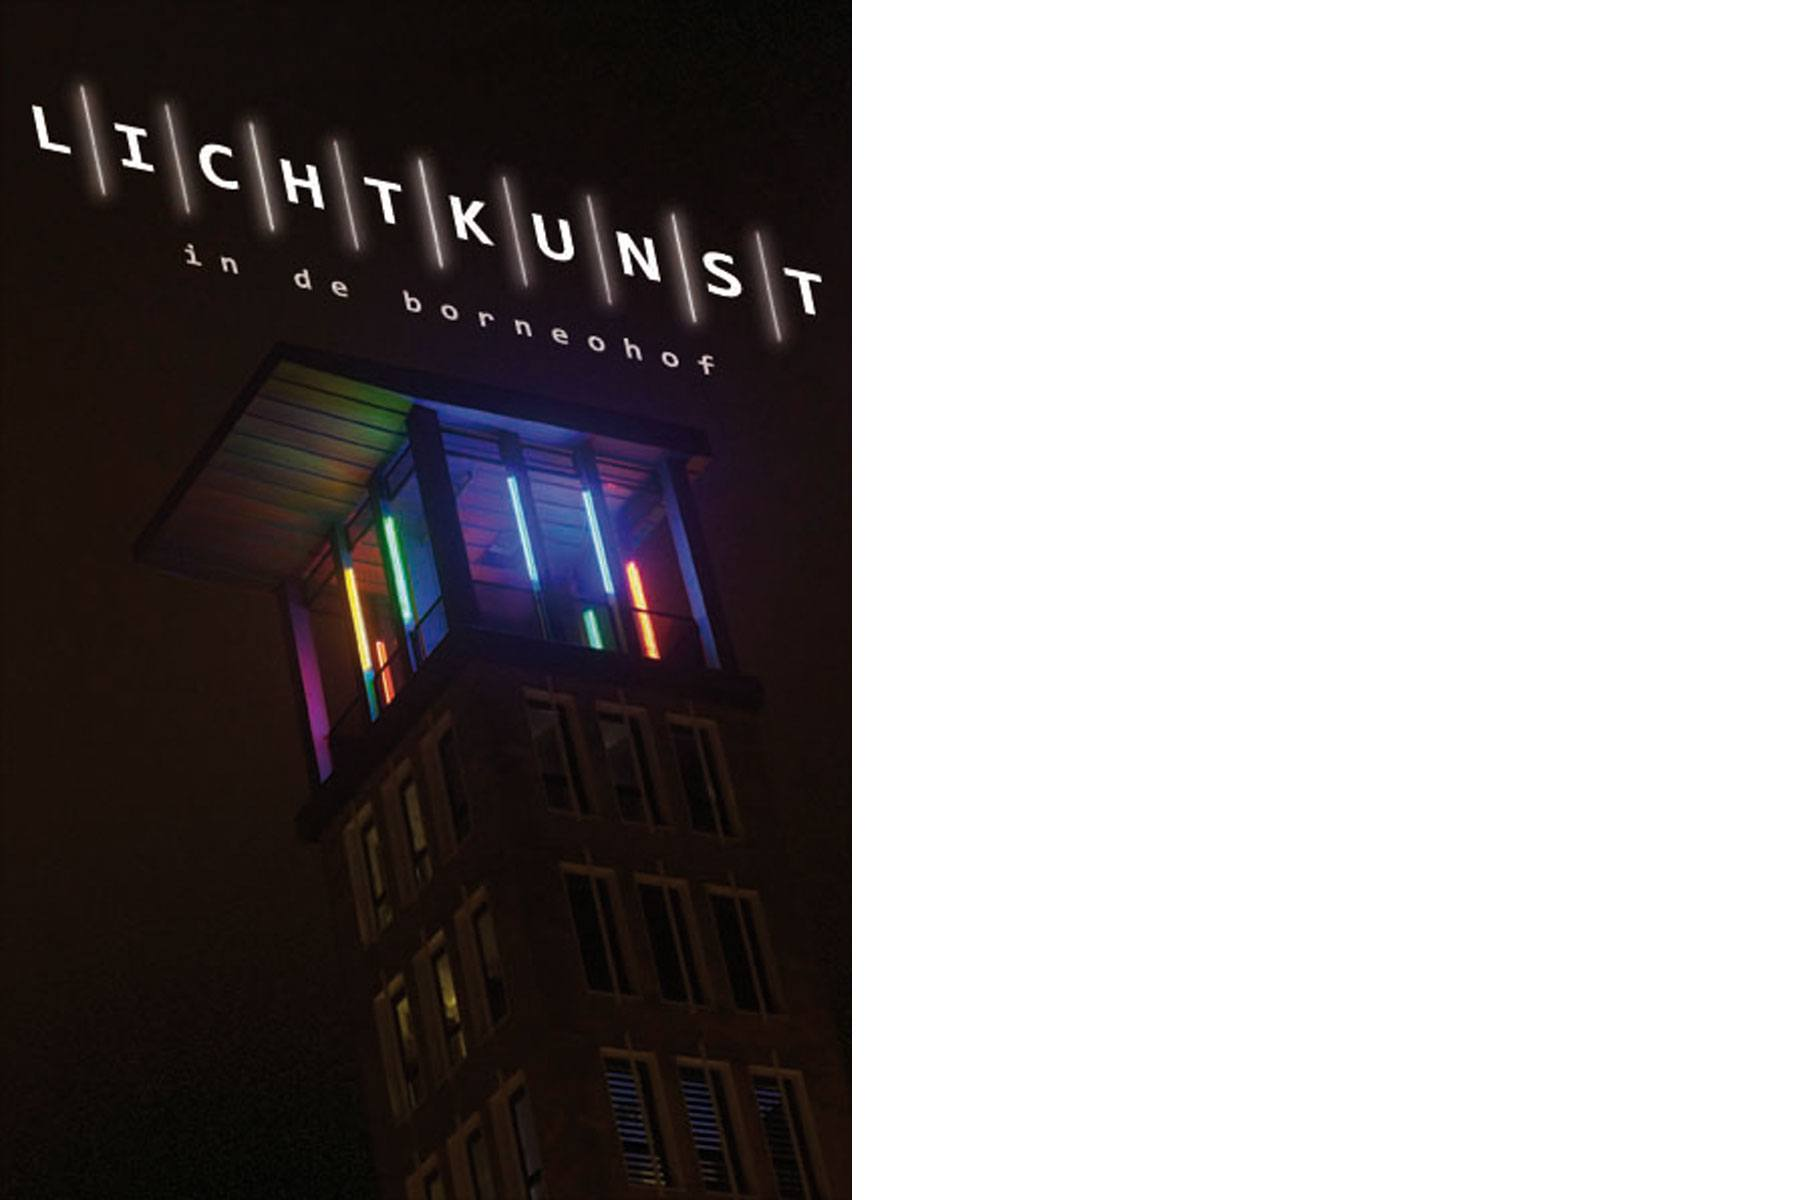 Lichtkunst in de Borneohof Amsterdam